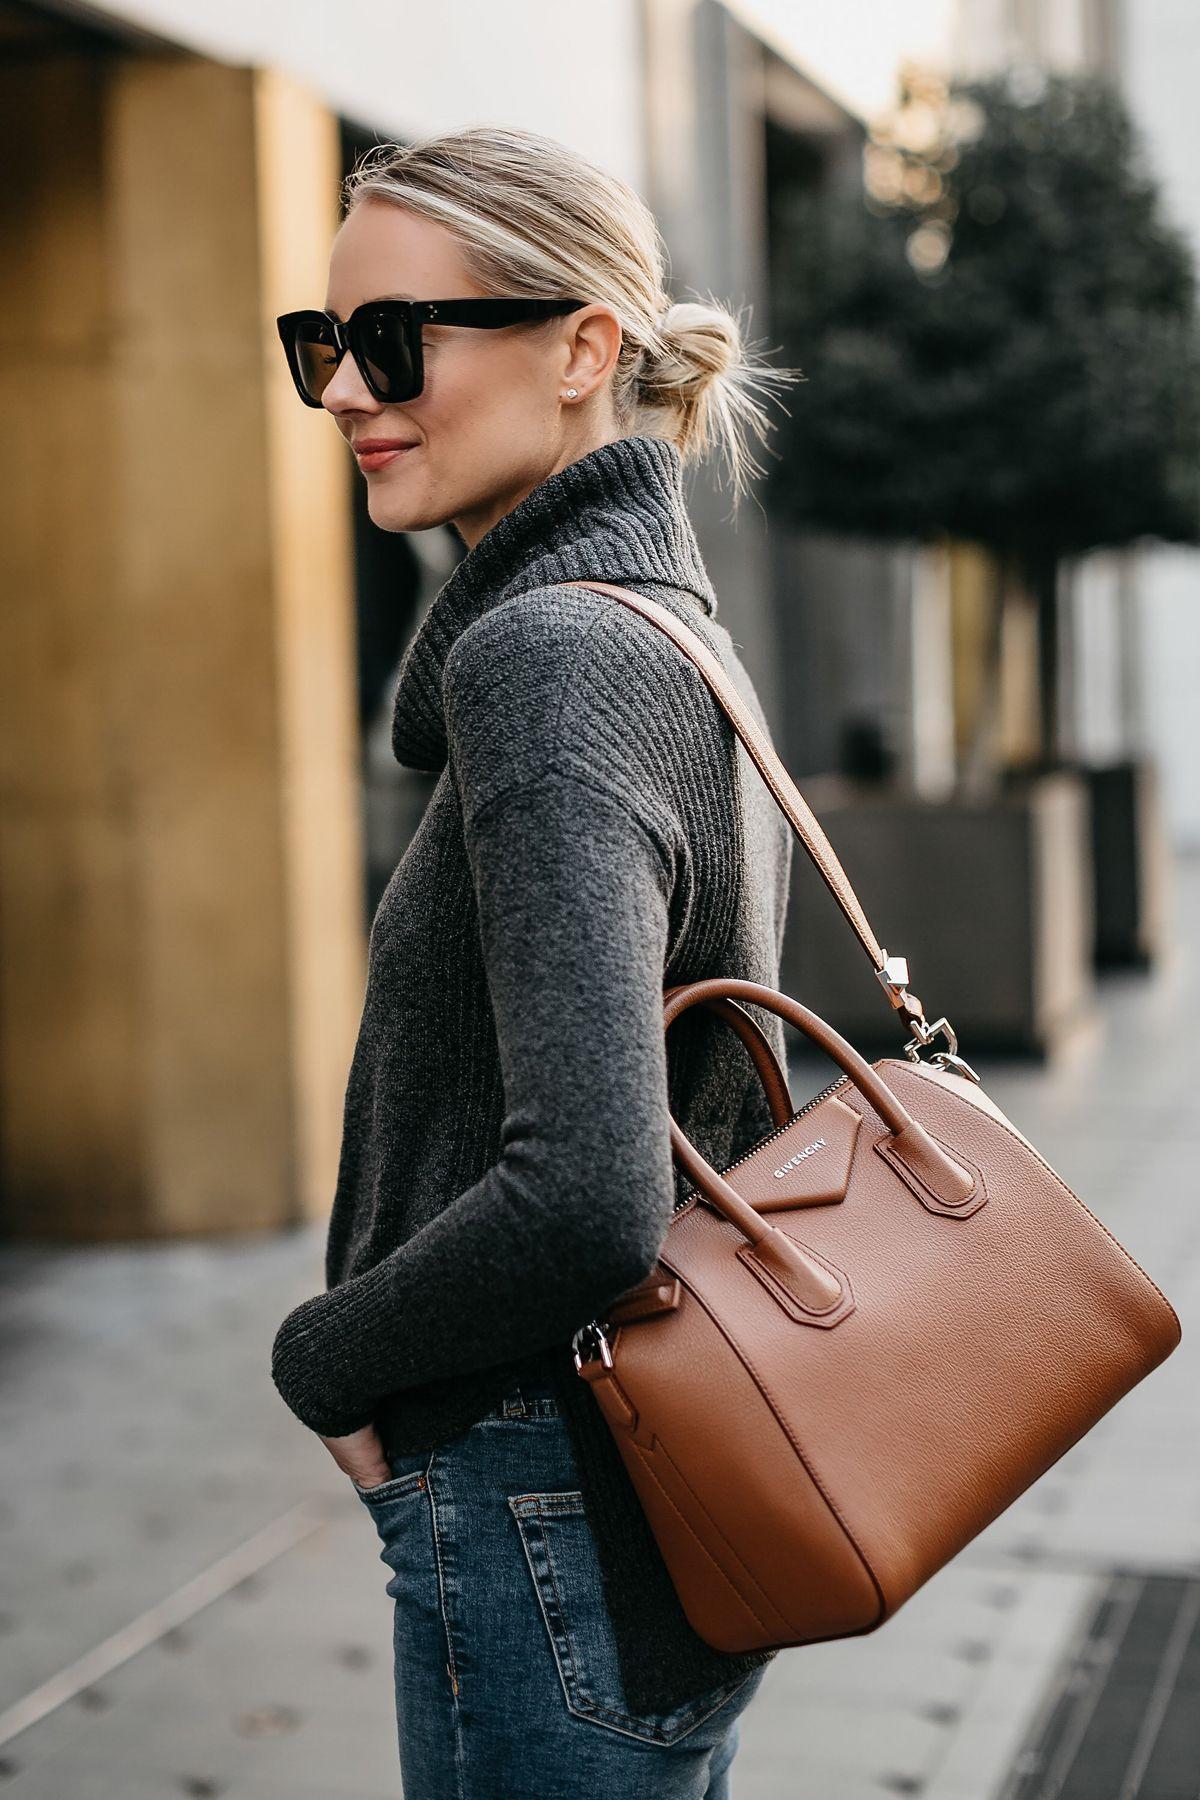 831439d9c9fc Blonde Woman Wearing Grey Turtleneck Sweater Givenchy Antigona Cognac  Handbag Fashion Jackson Dallas Blogger Fashion Blogger Street Style